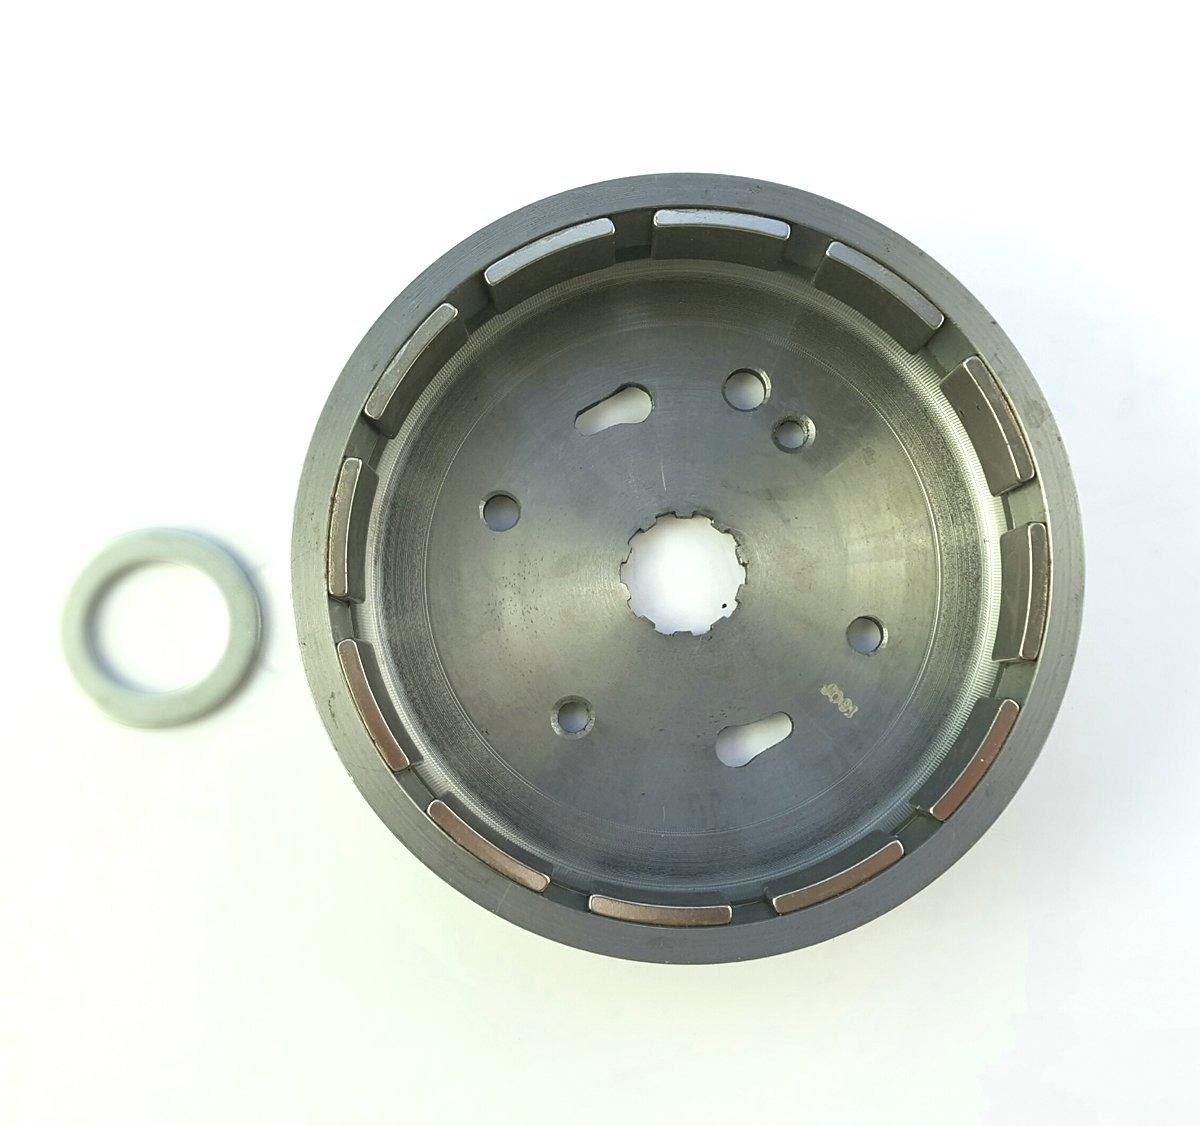 HARLEY DAVIDSON 45 AMP ROTOR Replaces OEM 29999-97 & 29999-97B